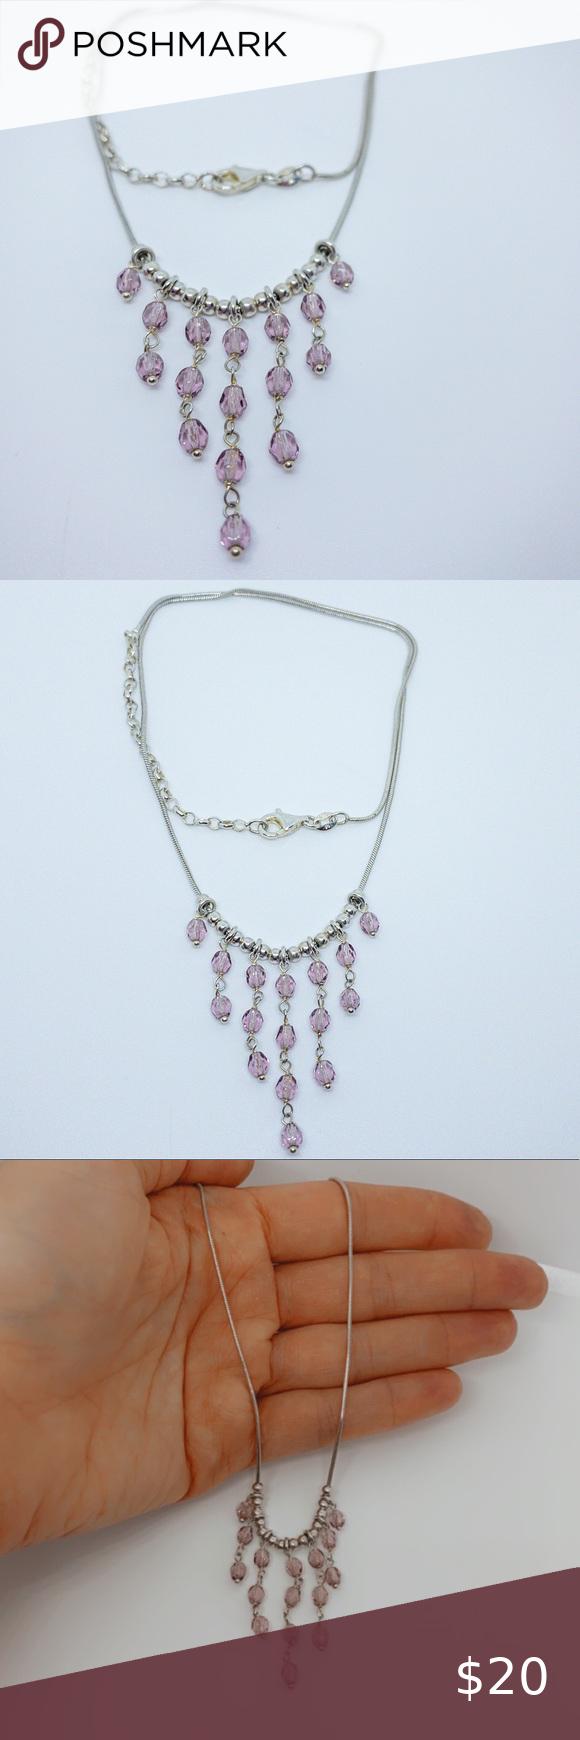 Purple Amethyst Quartz Handmade Sterling Siver Plated Pendant 2 Pocketfriendly Matching Jewelry!